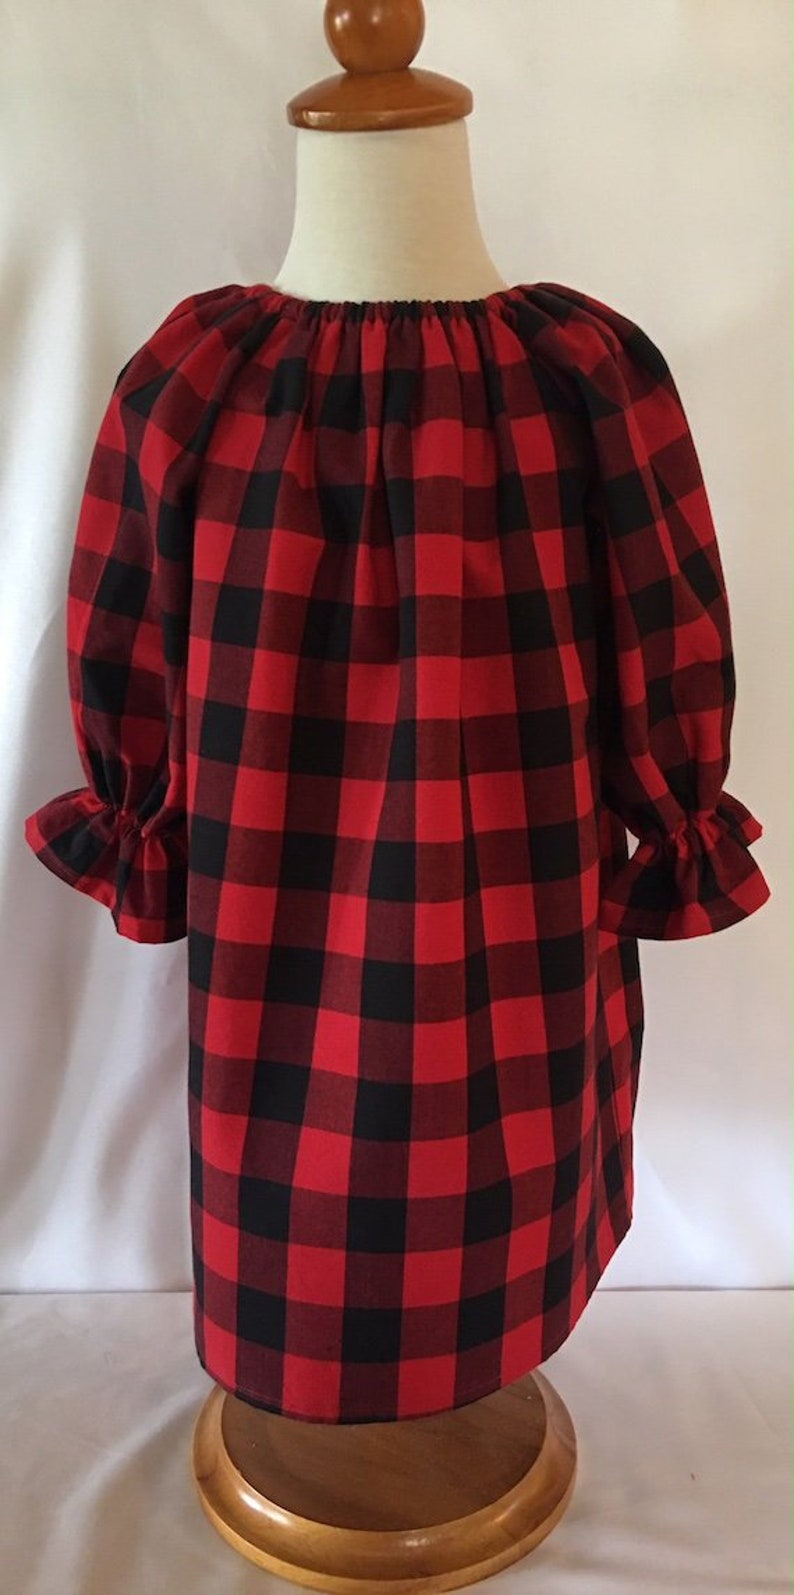 afab2c485496 Girls Buffalo Plaid Christmas Dress Red and Black Holiday | Etsy